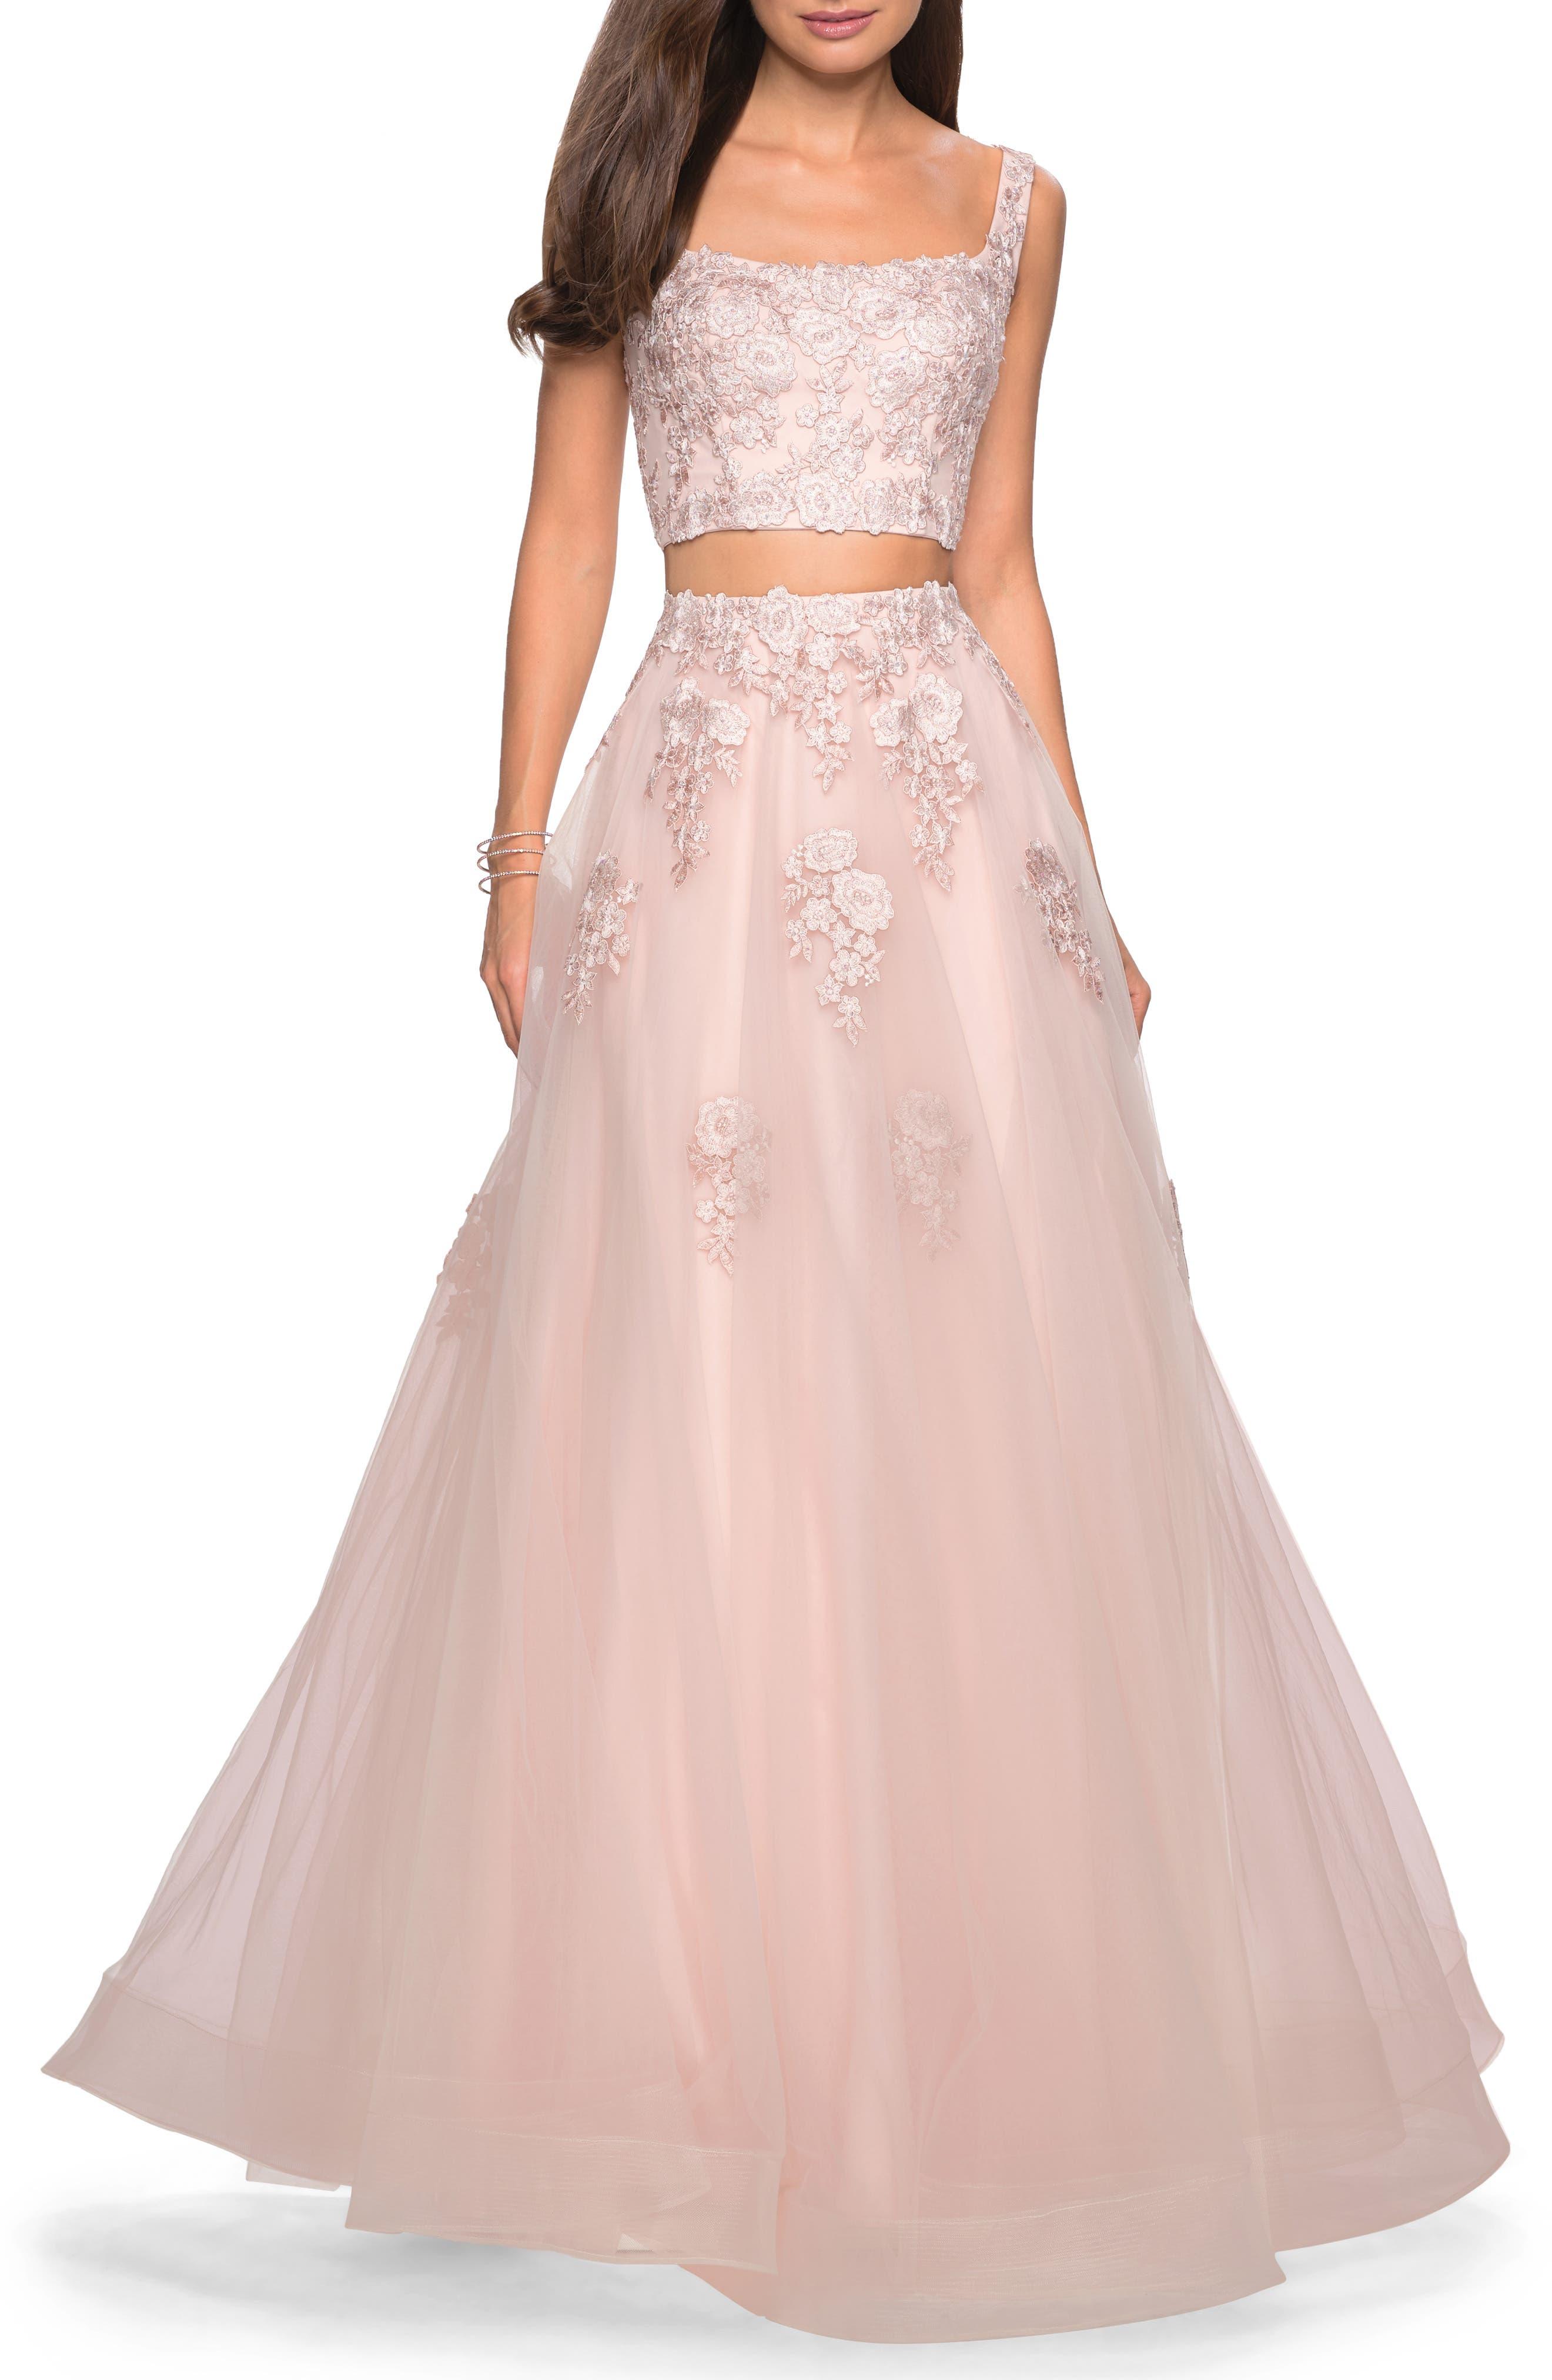 La Femme Two-Piece Tulle & Lace Evening Dress, Pink